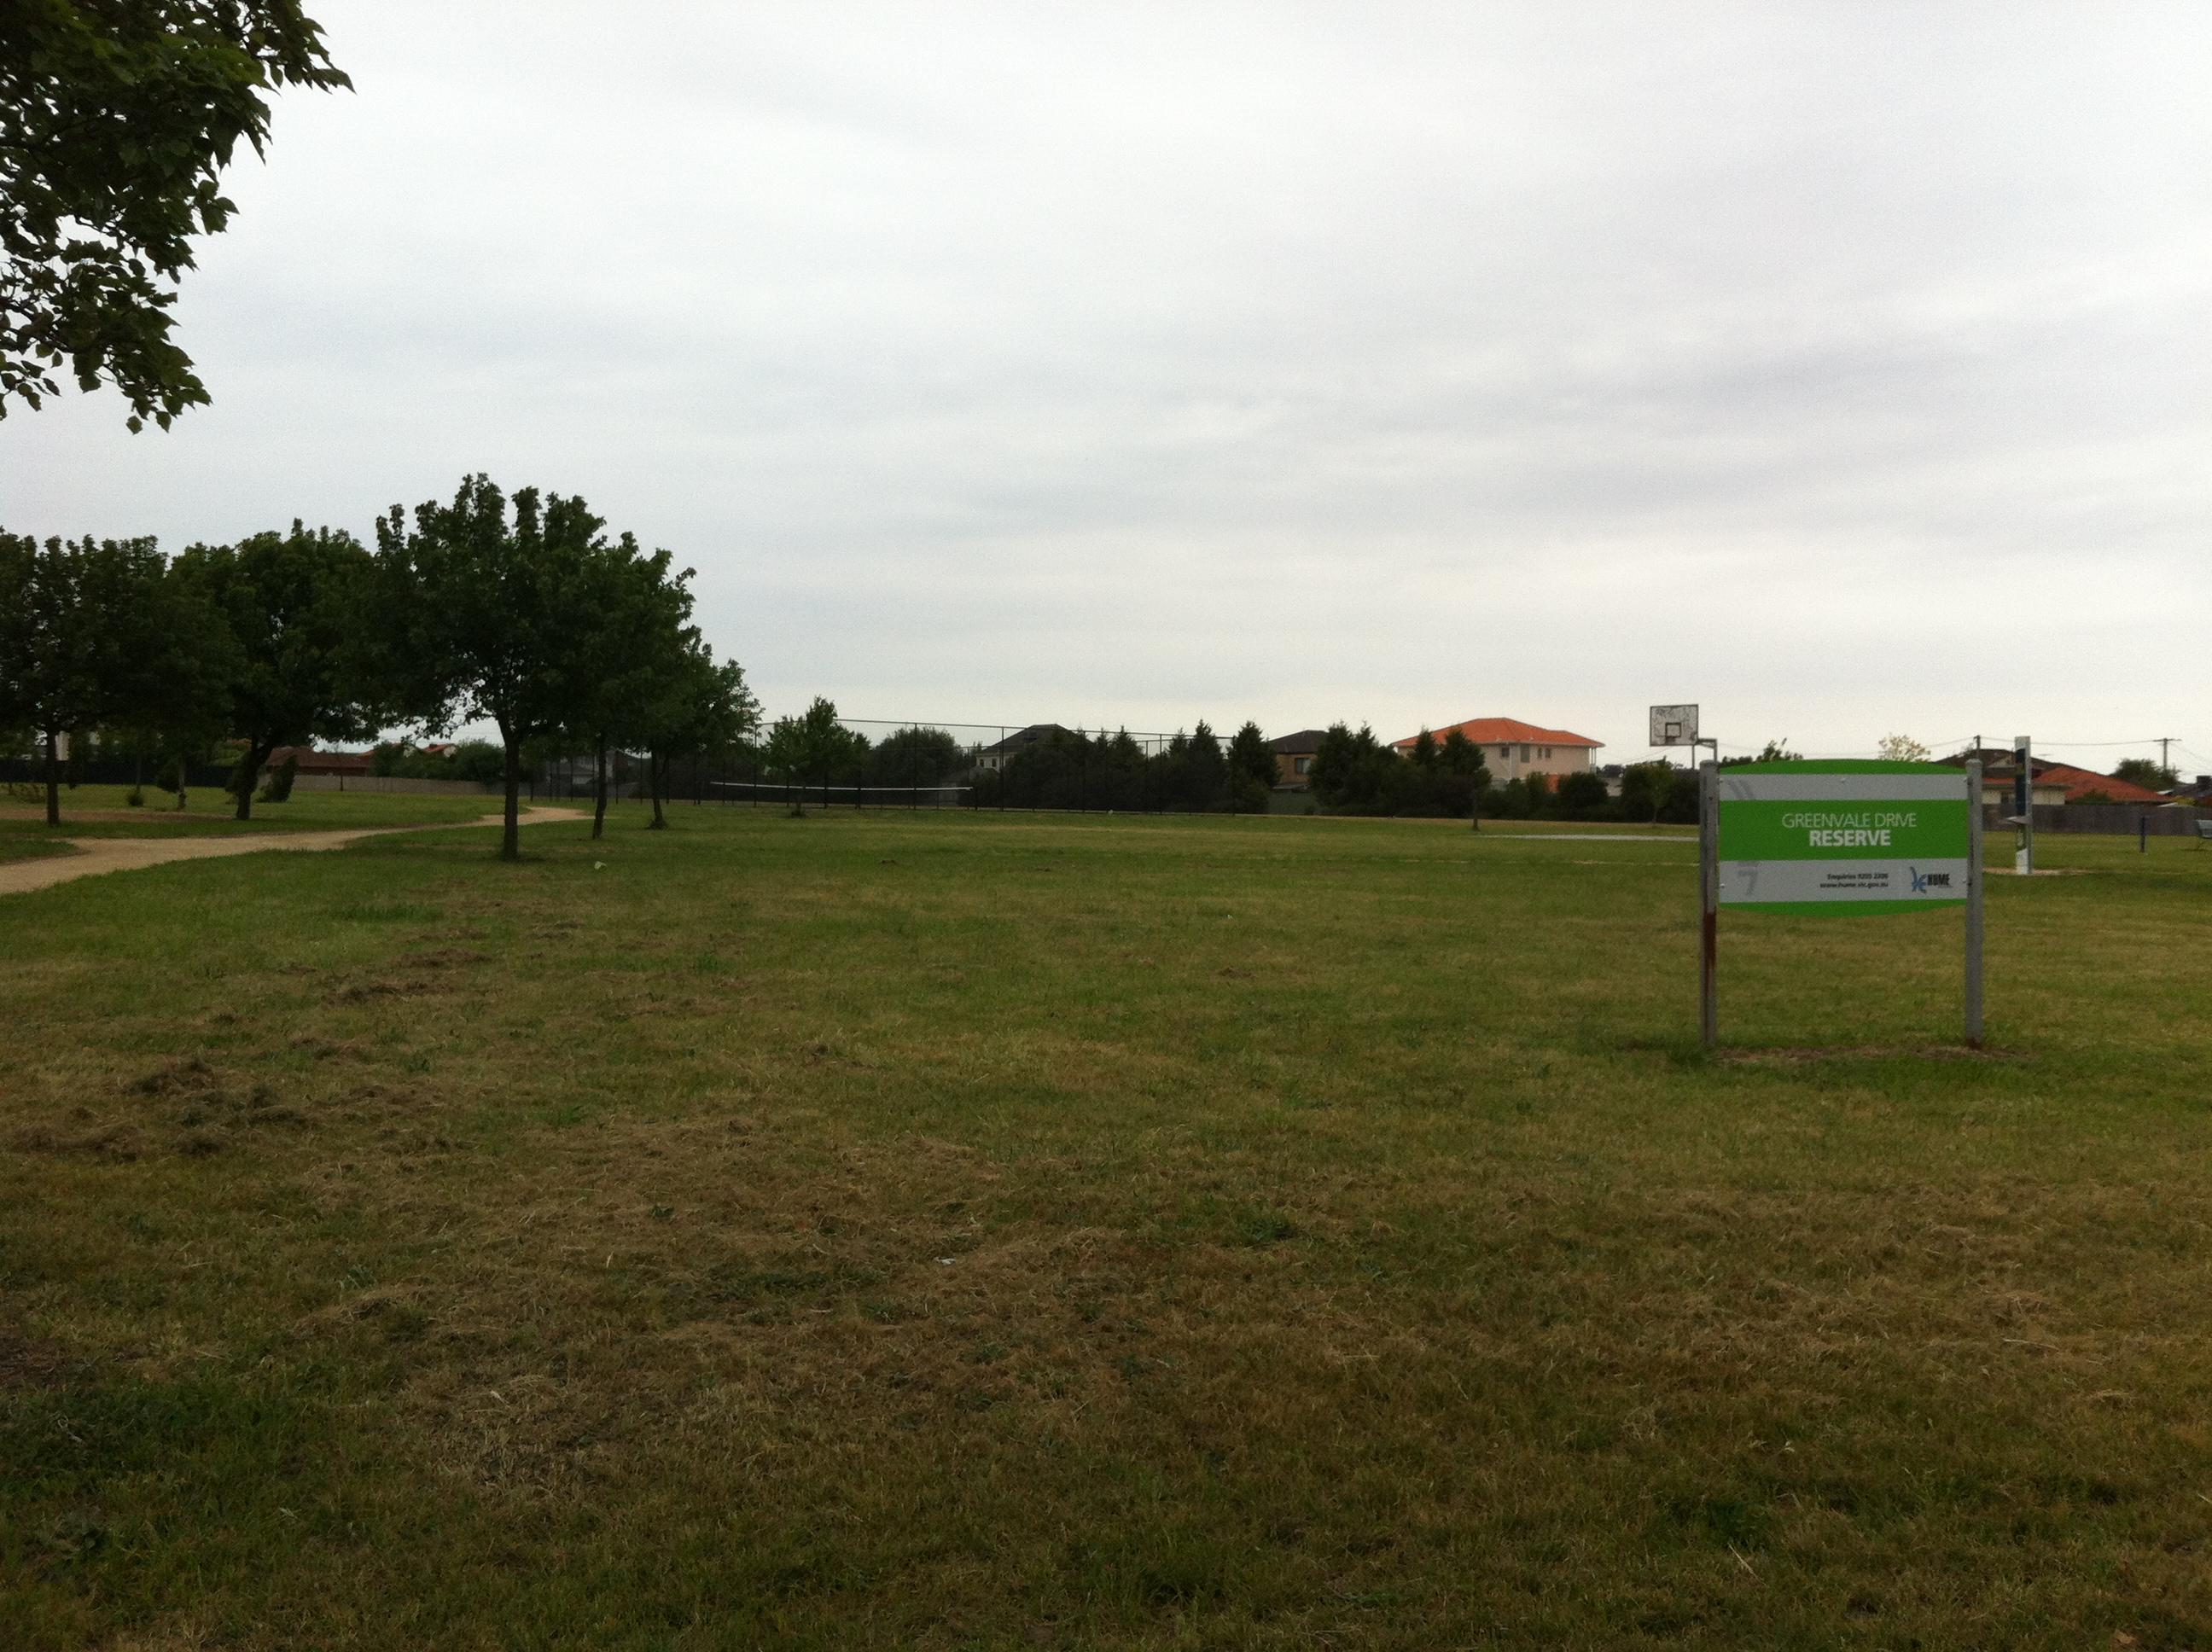 Greenvale Drive Reserve